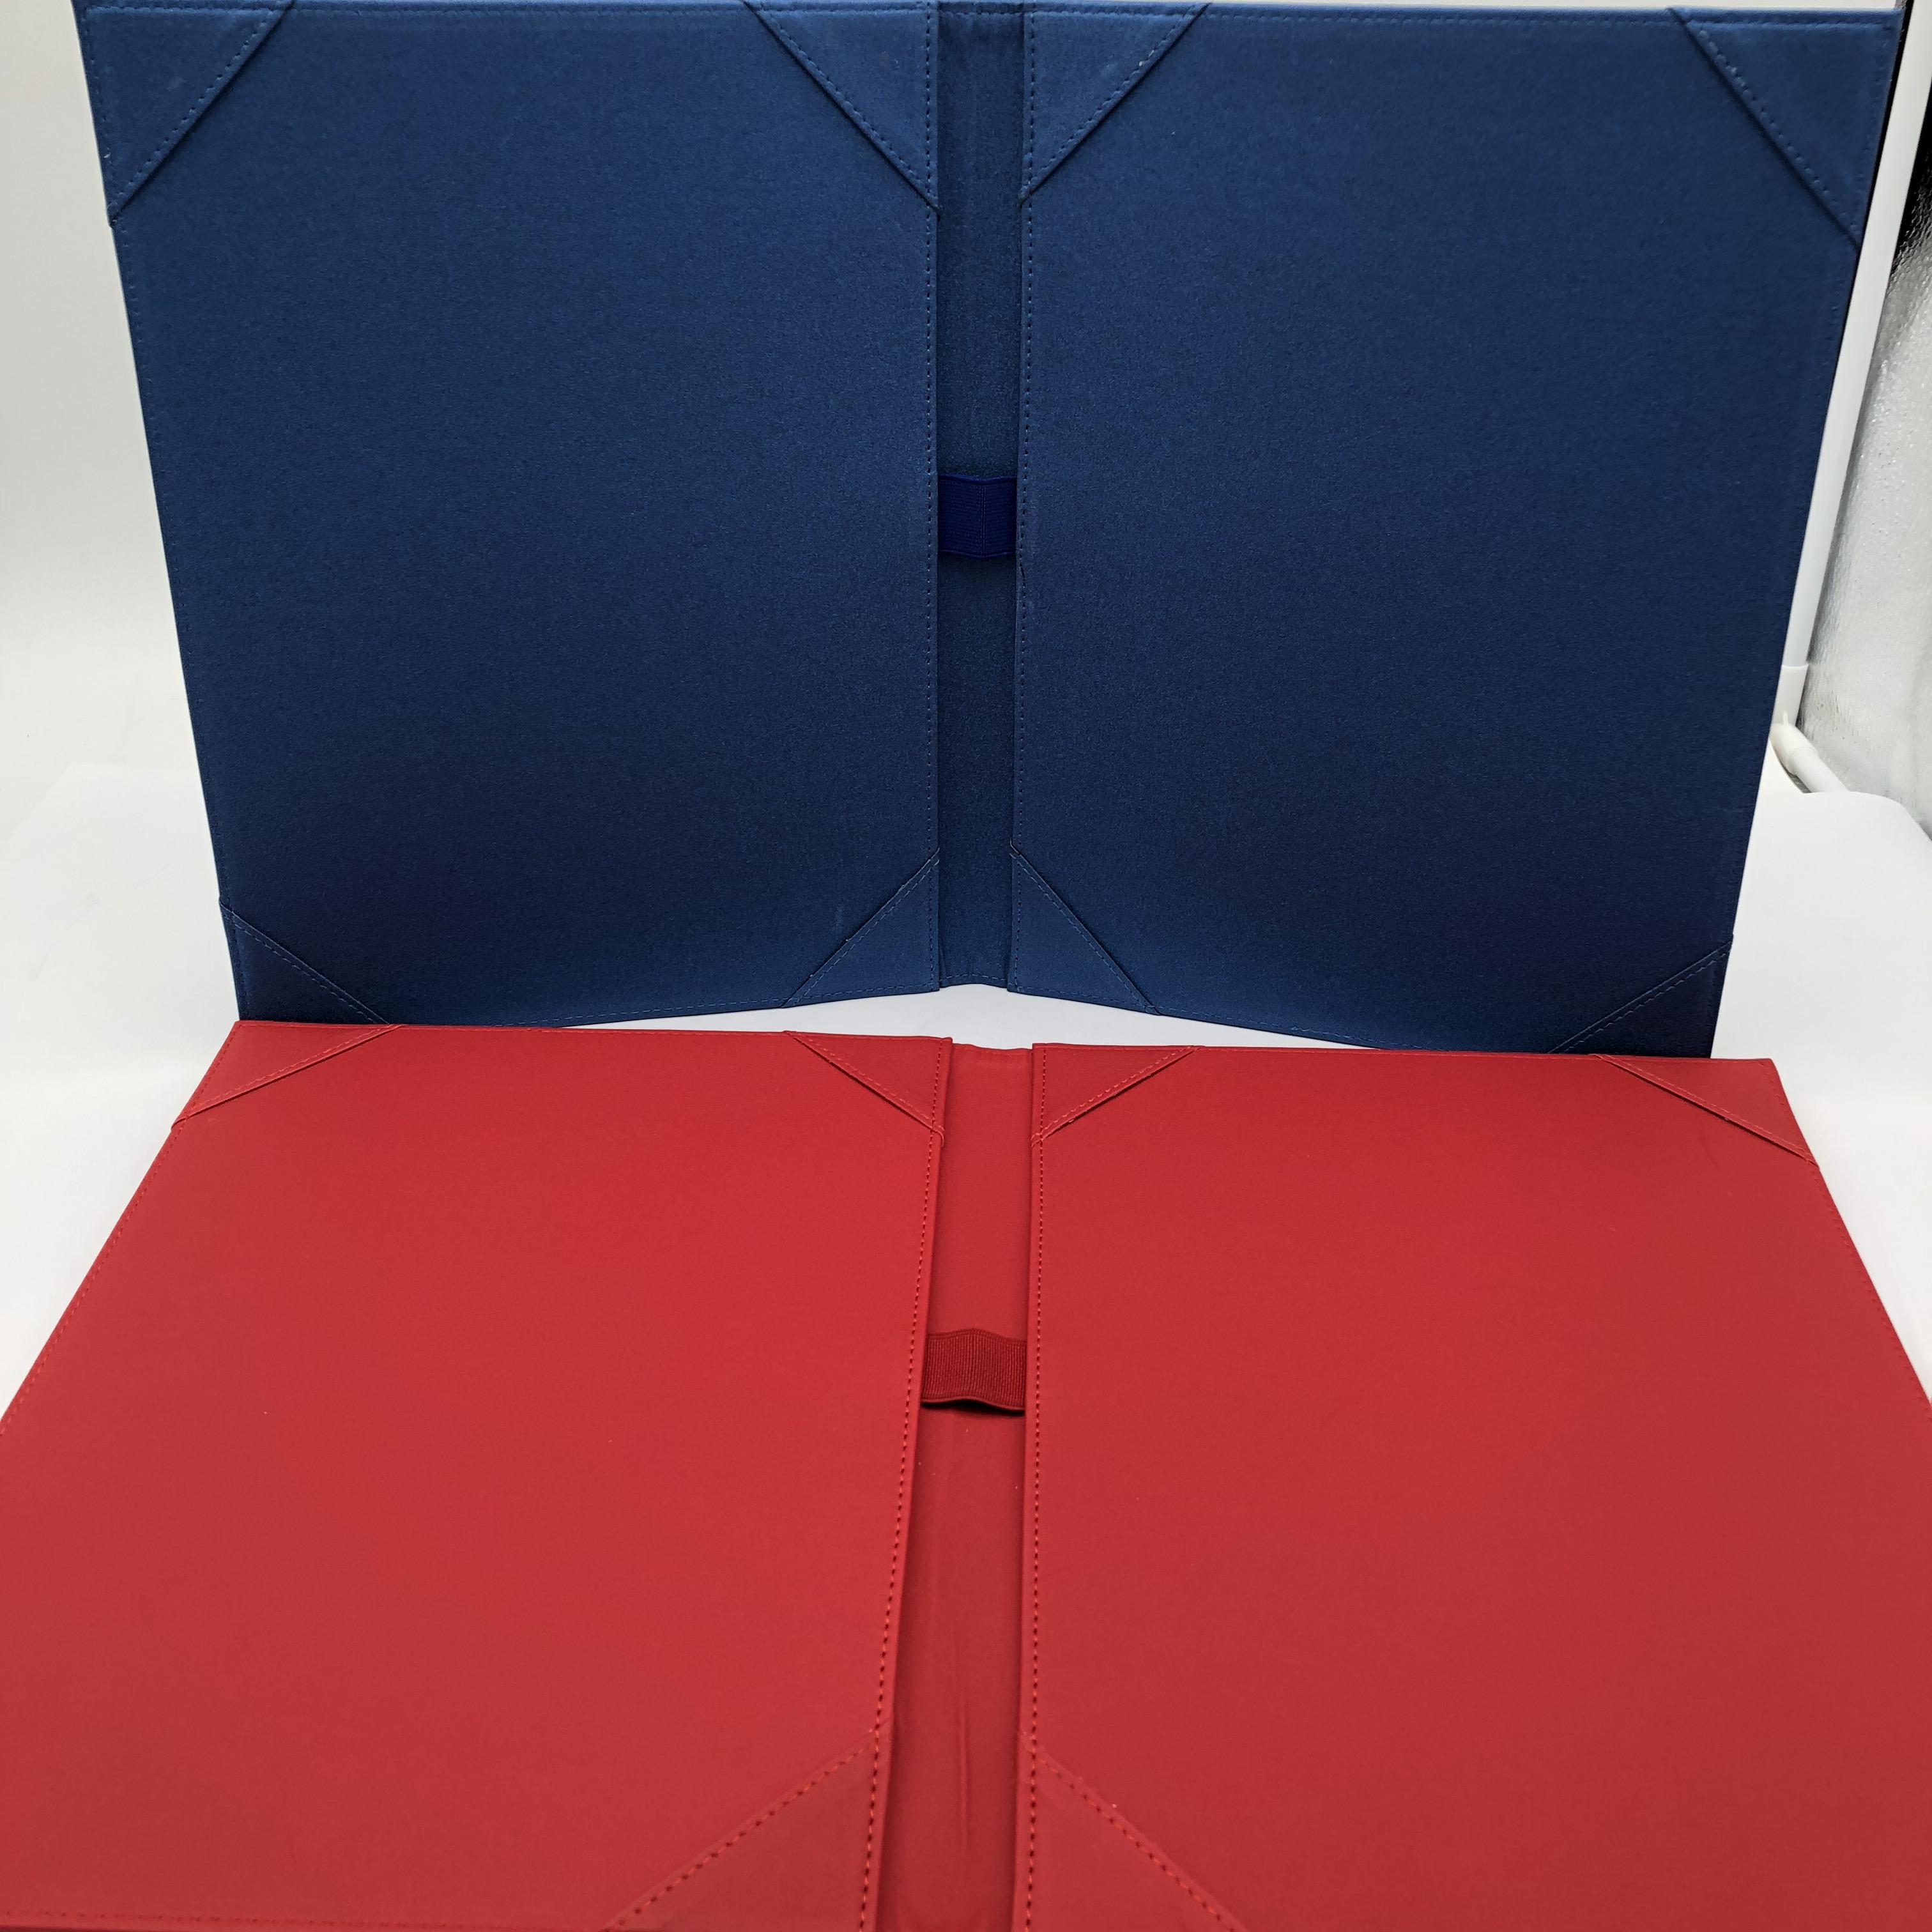 Office supplies stationery document zip presentation leather portfolio folder